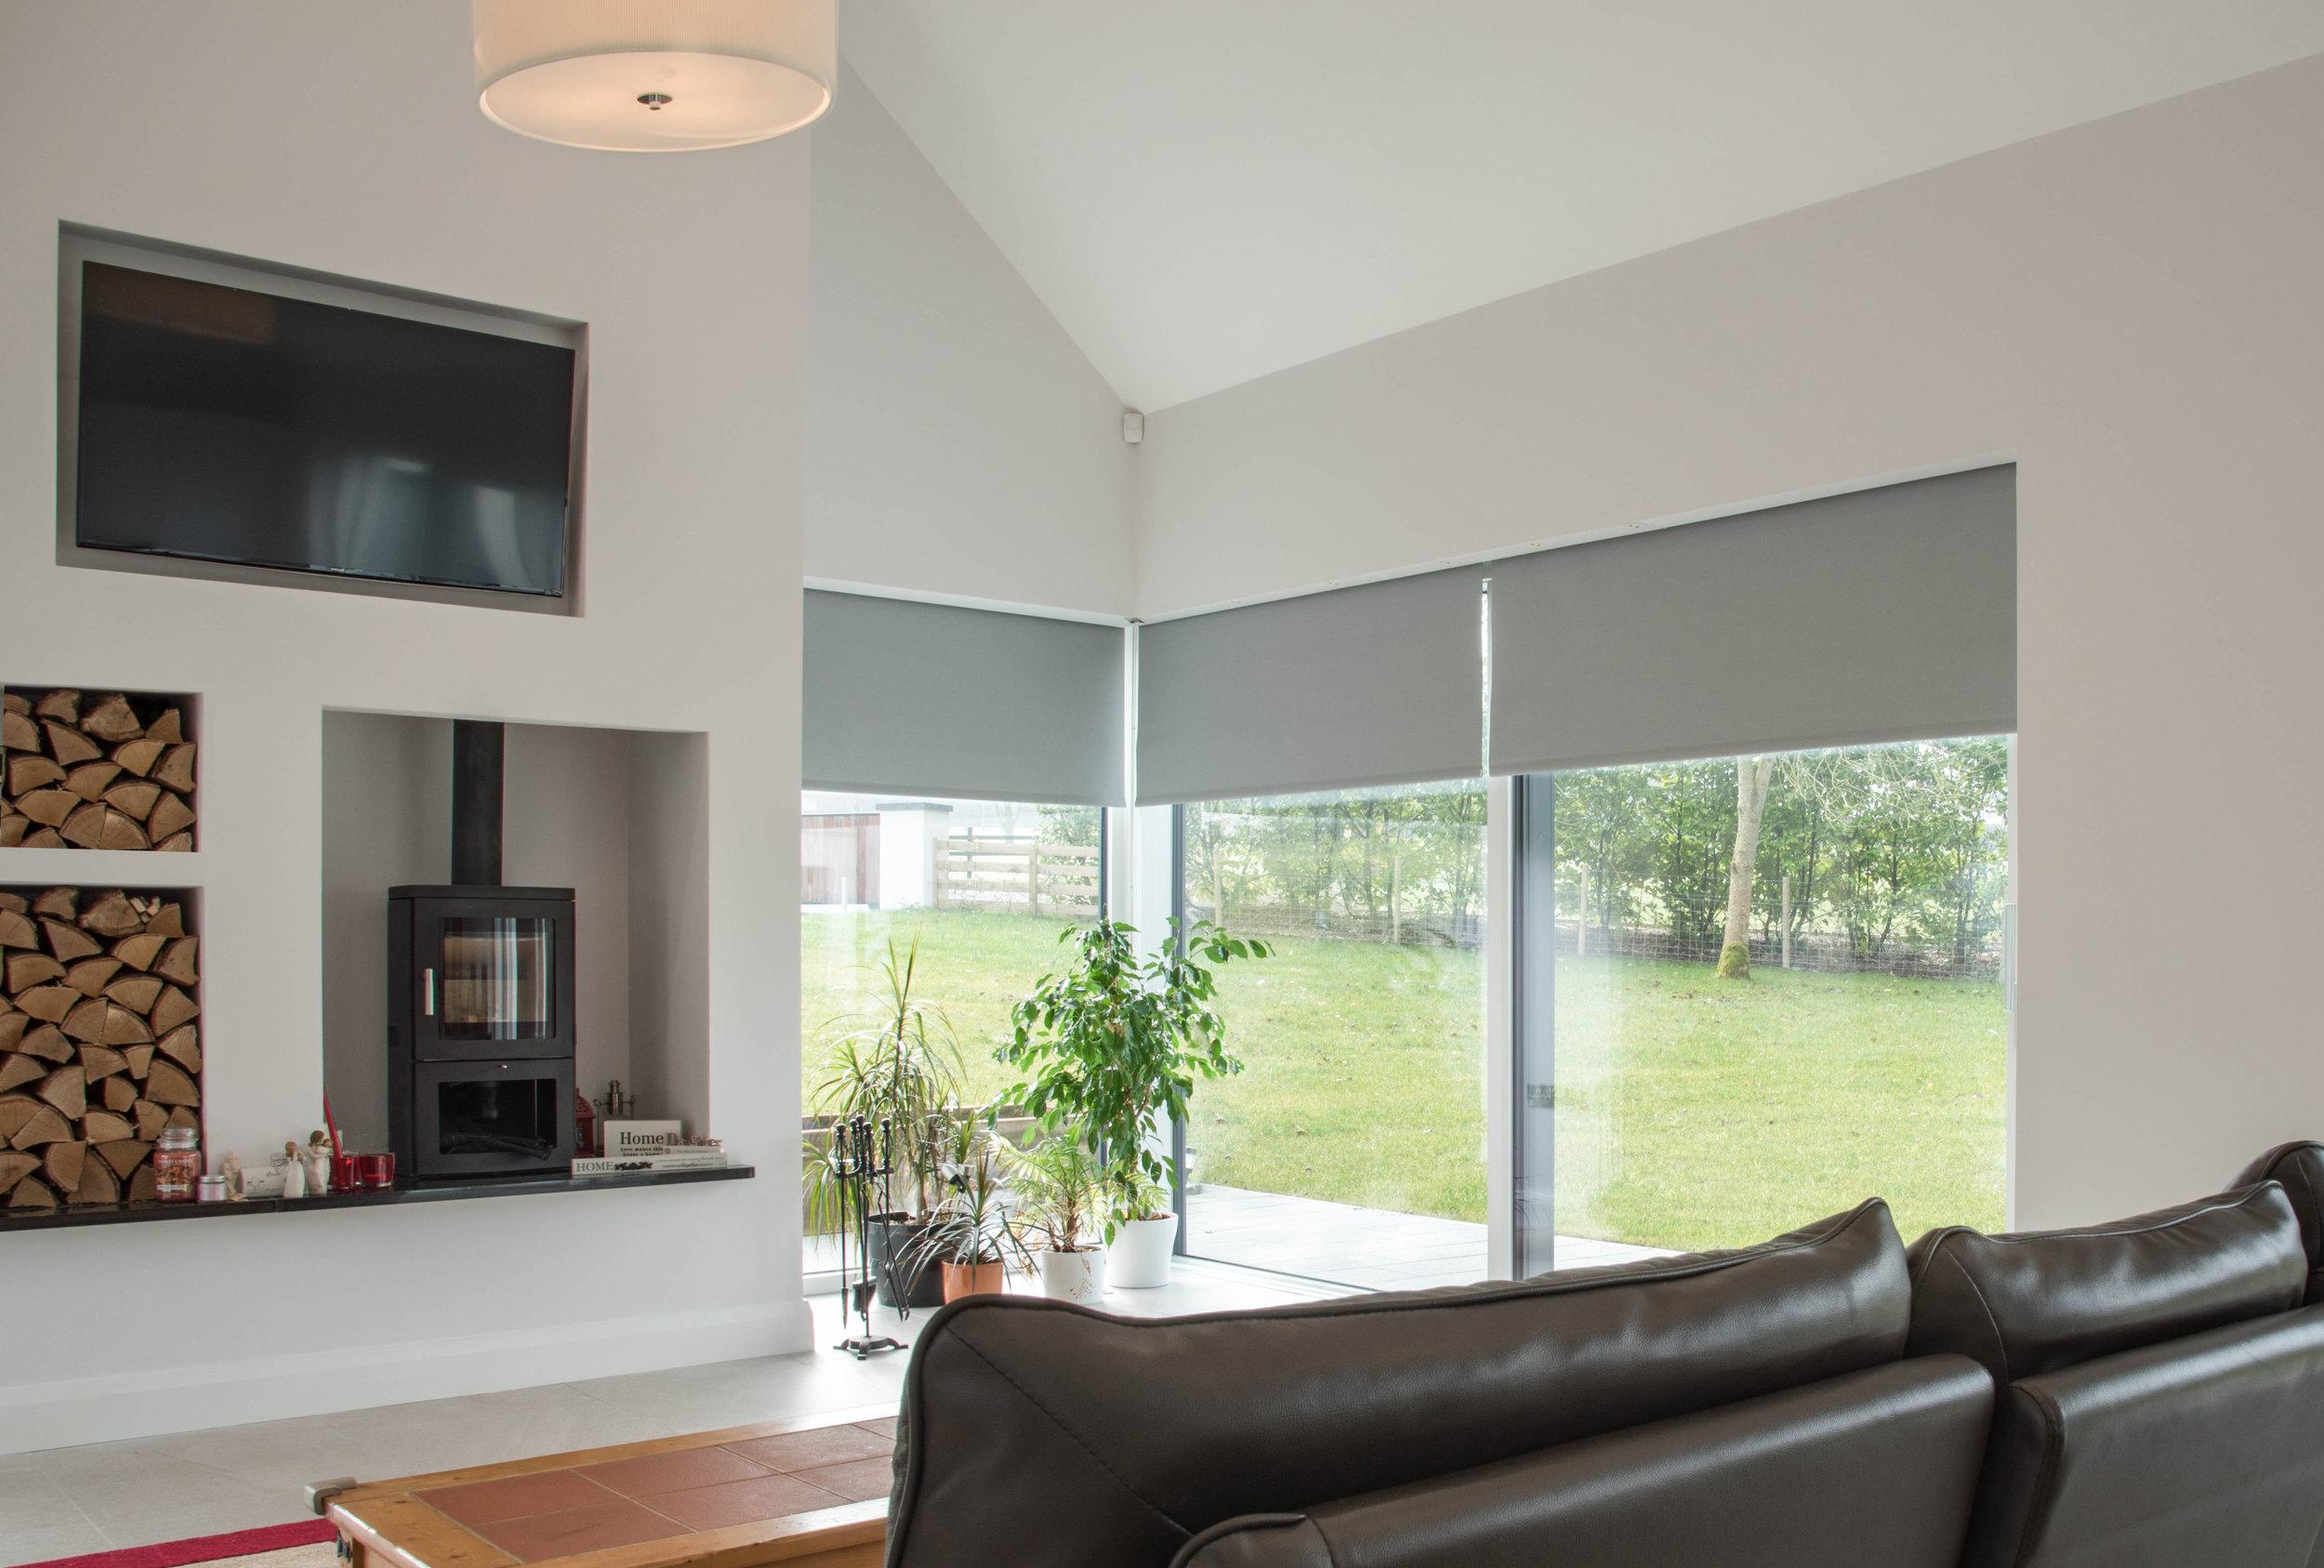 Paul_McAlister_Architects_Passive_House_Corner_Window.jpg